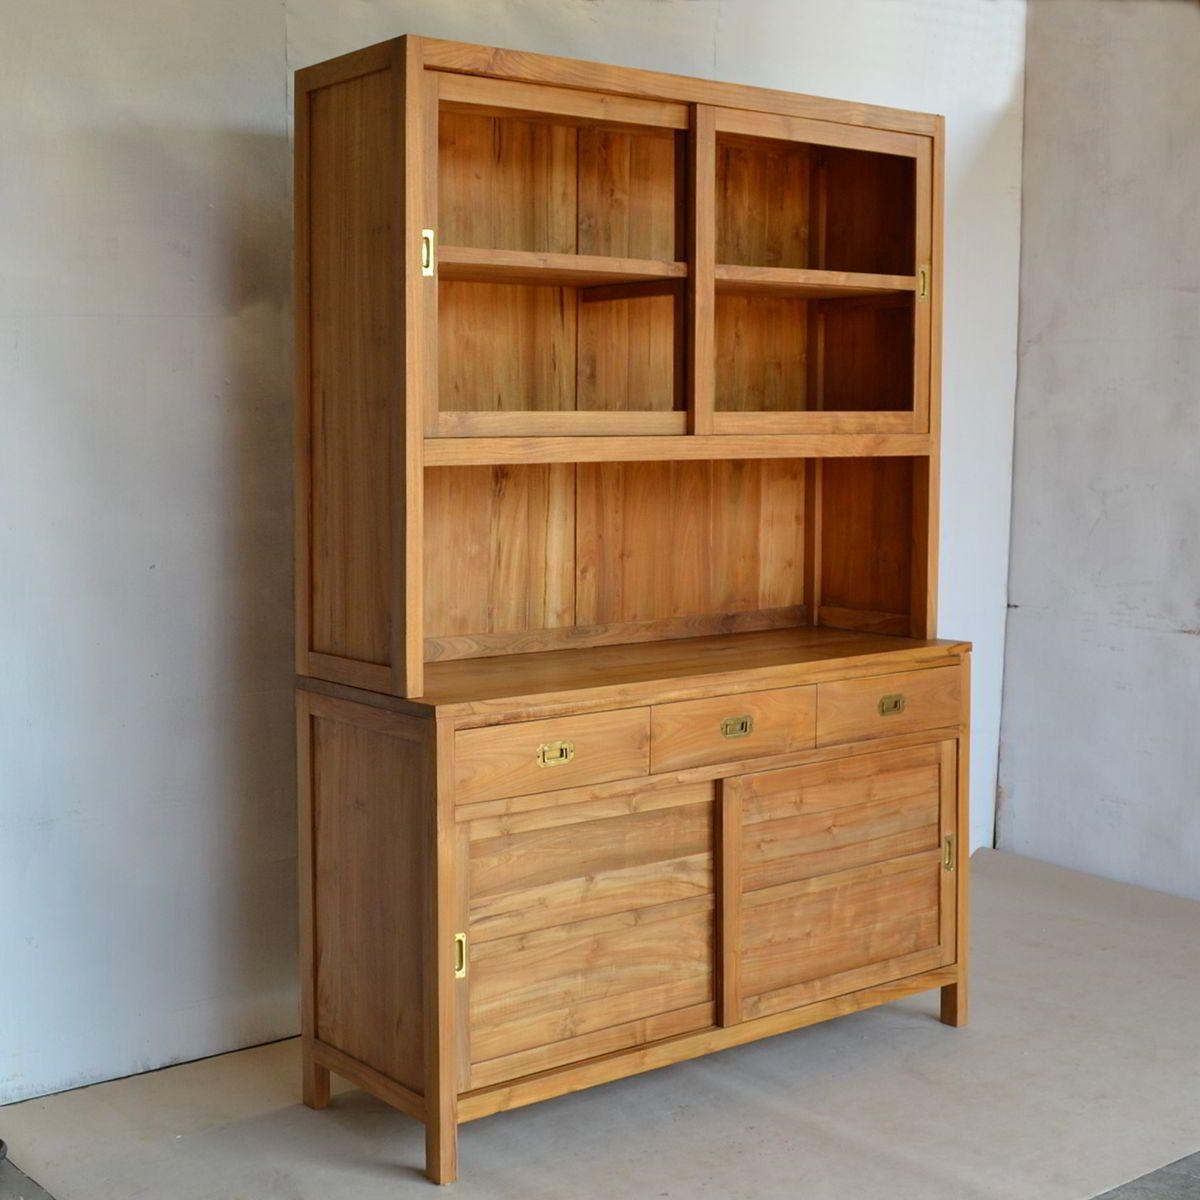 Lemari dapur pintu geser kayu jati | Lemari dapur, Kayu ...